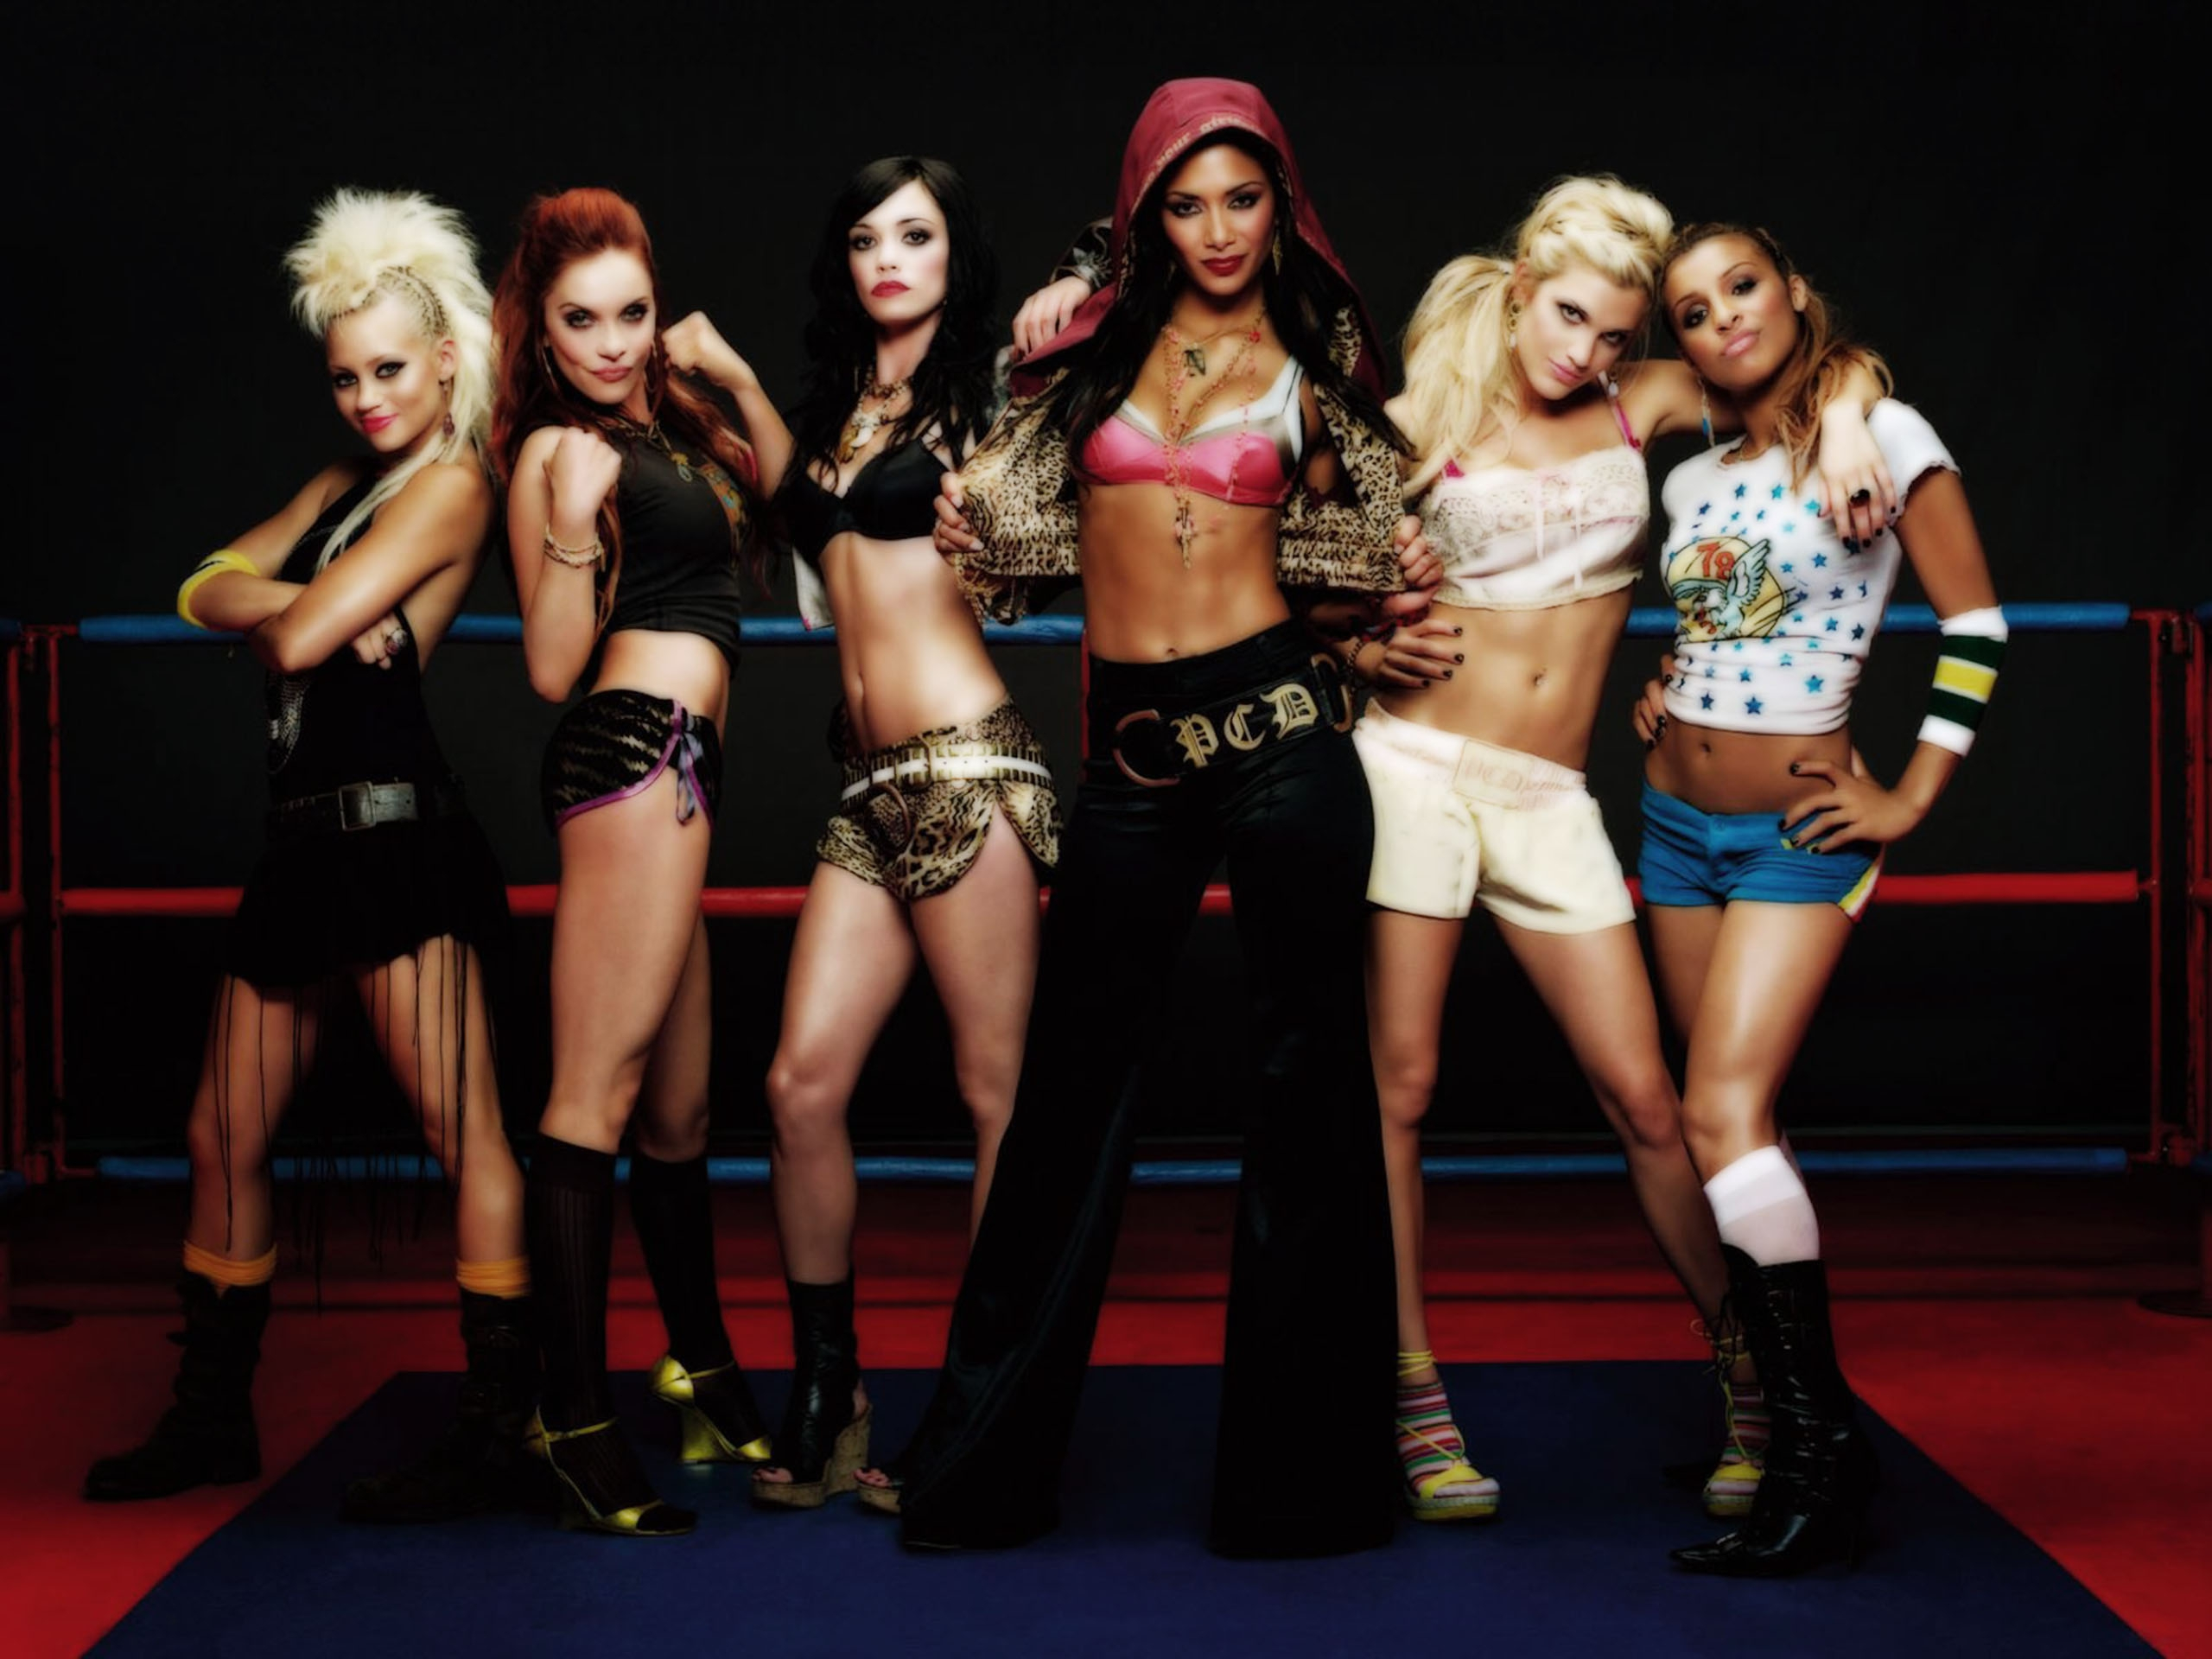 The Pussycat Dolls High Definition